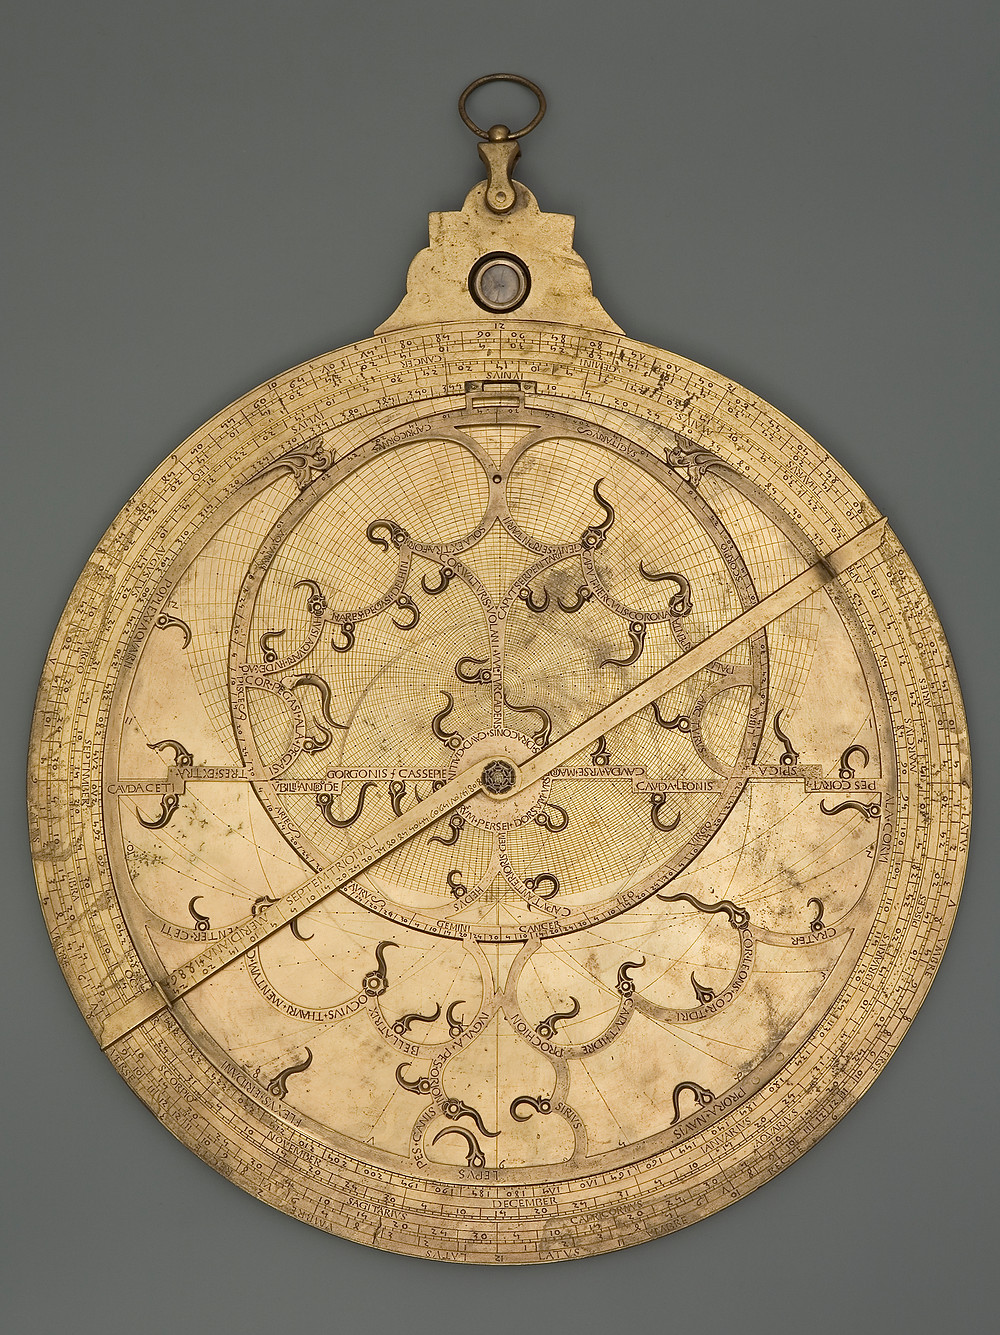 Conversations with God Jan Matejko's Copernicus vingt sept magazine